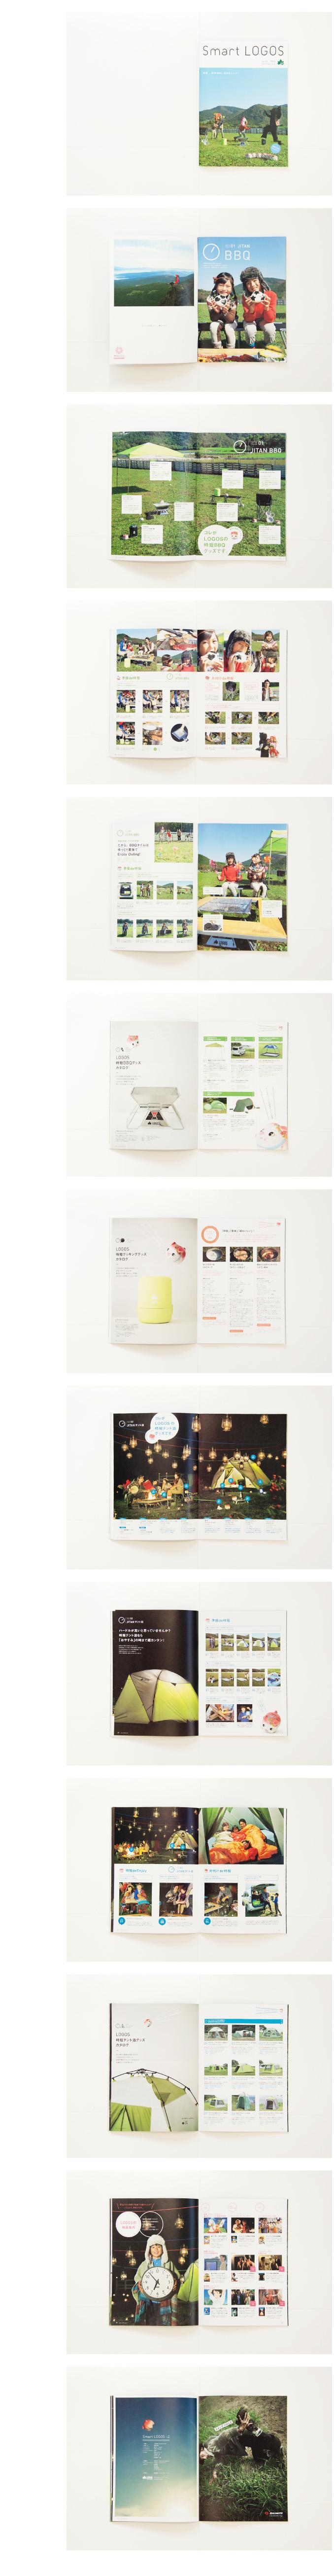 Smart LOGOS vol.01 2012